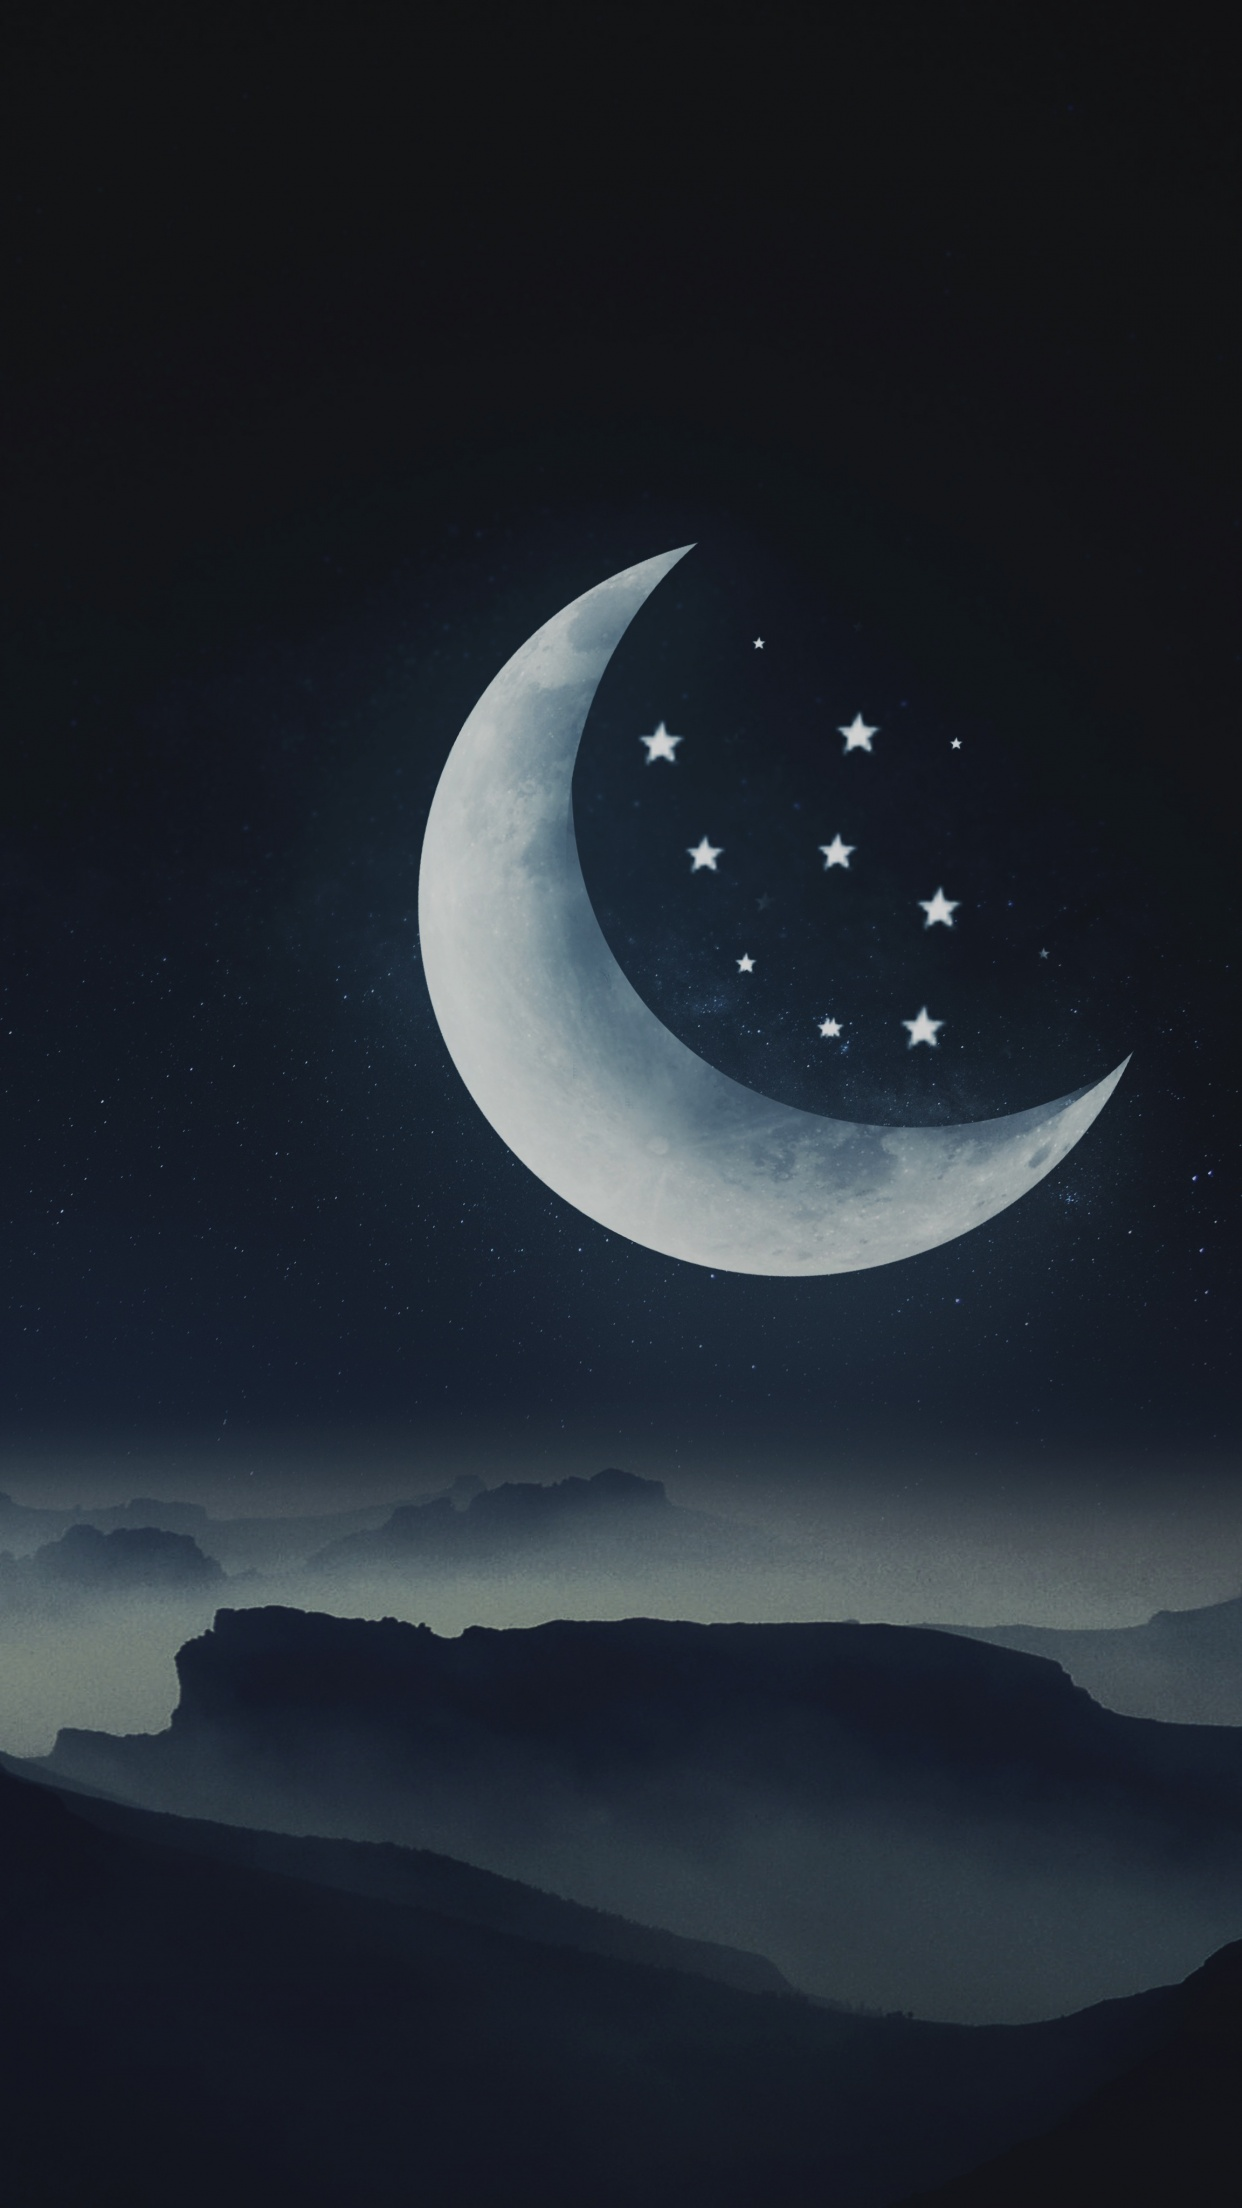 Half moon Wallpaper 21K, Stars, Mountains, Night, Cold, Aesthetic ...